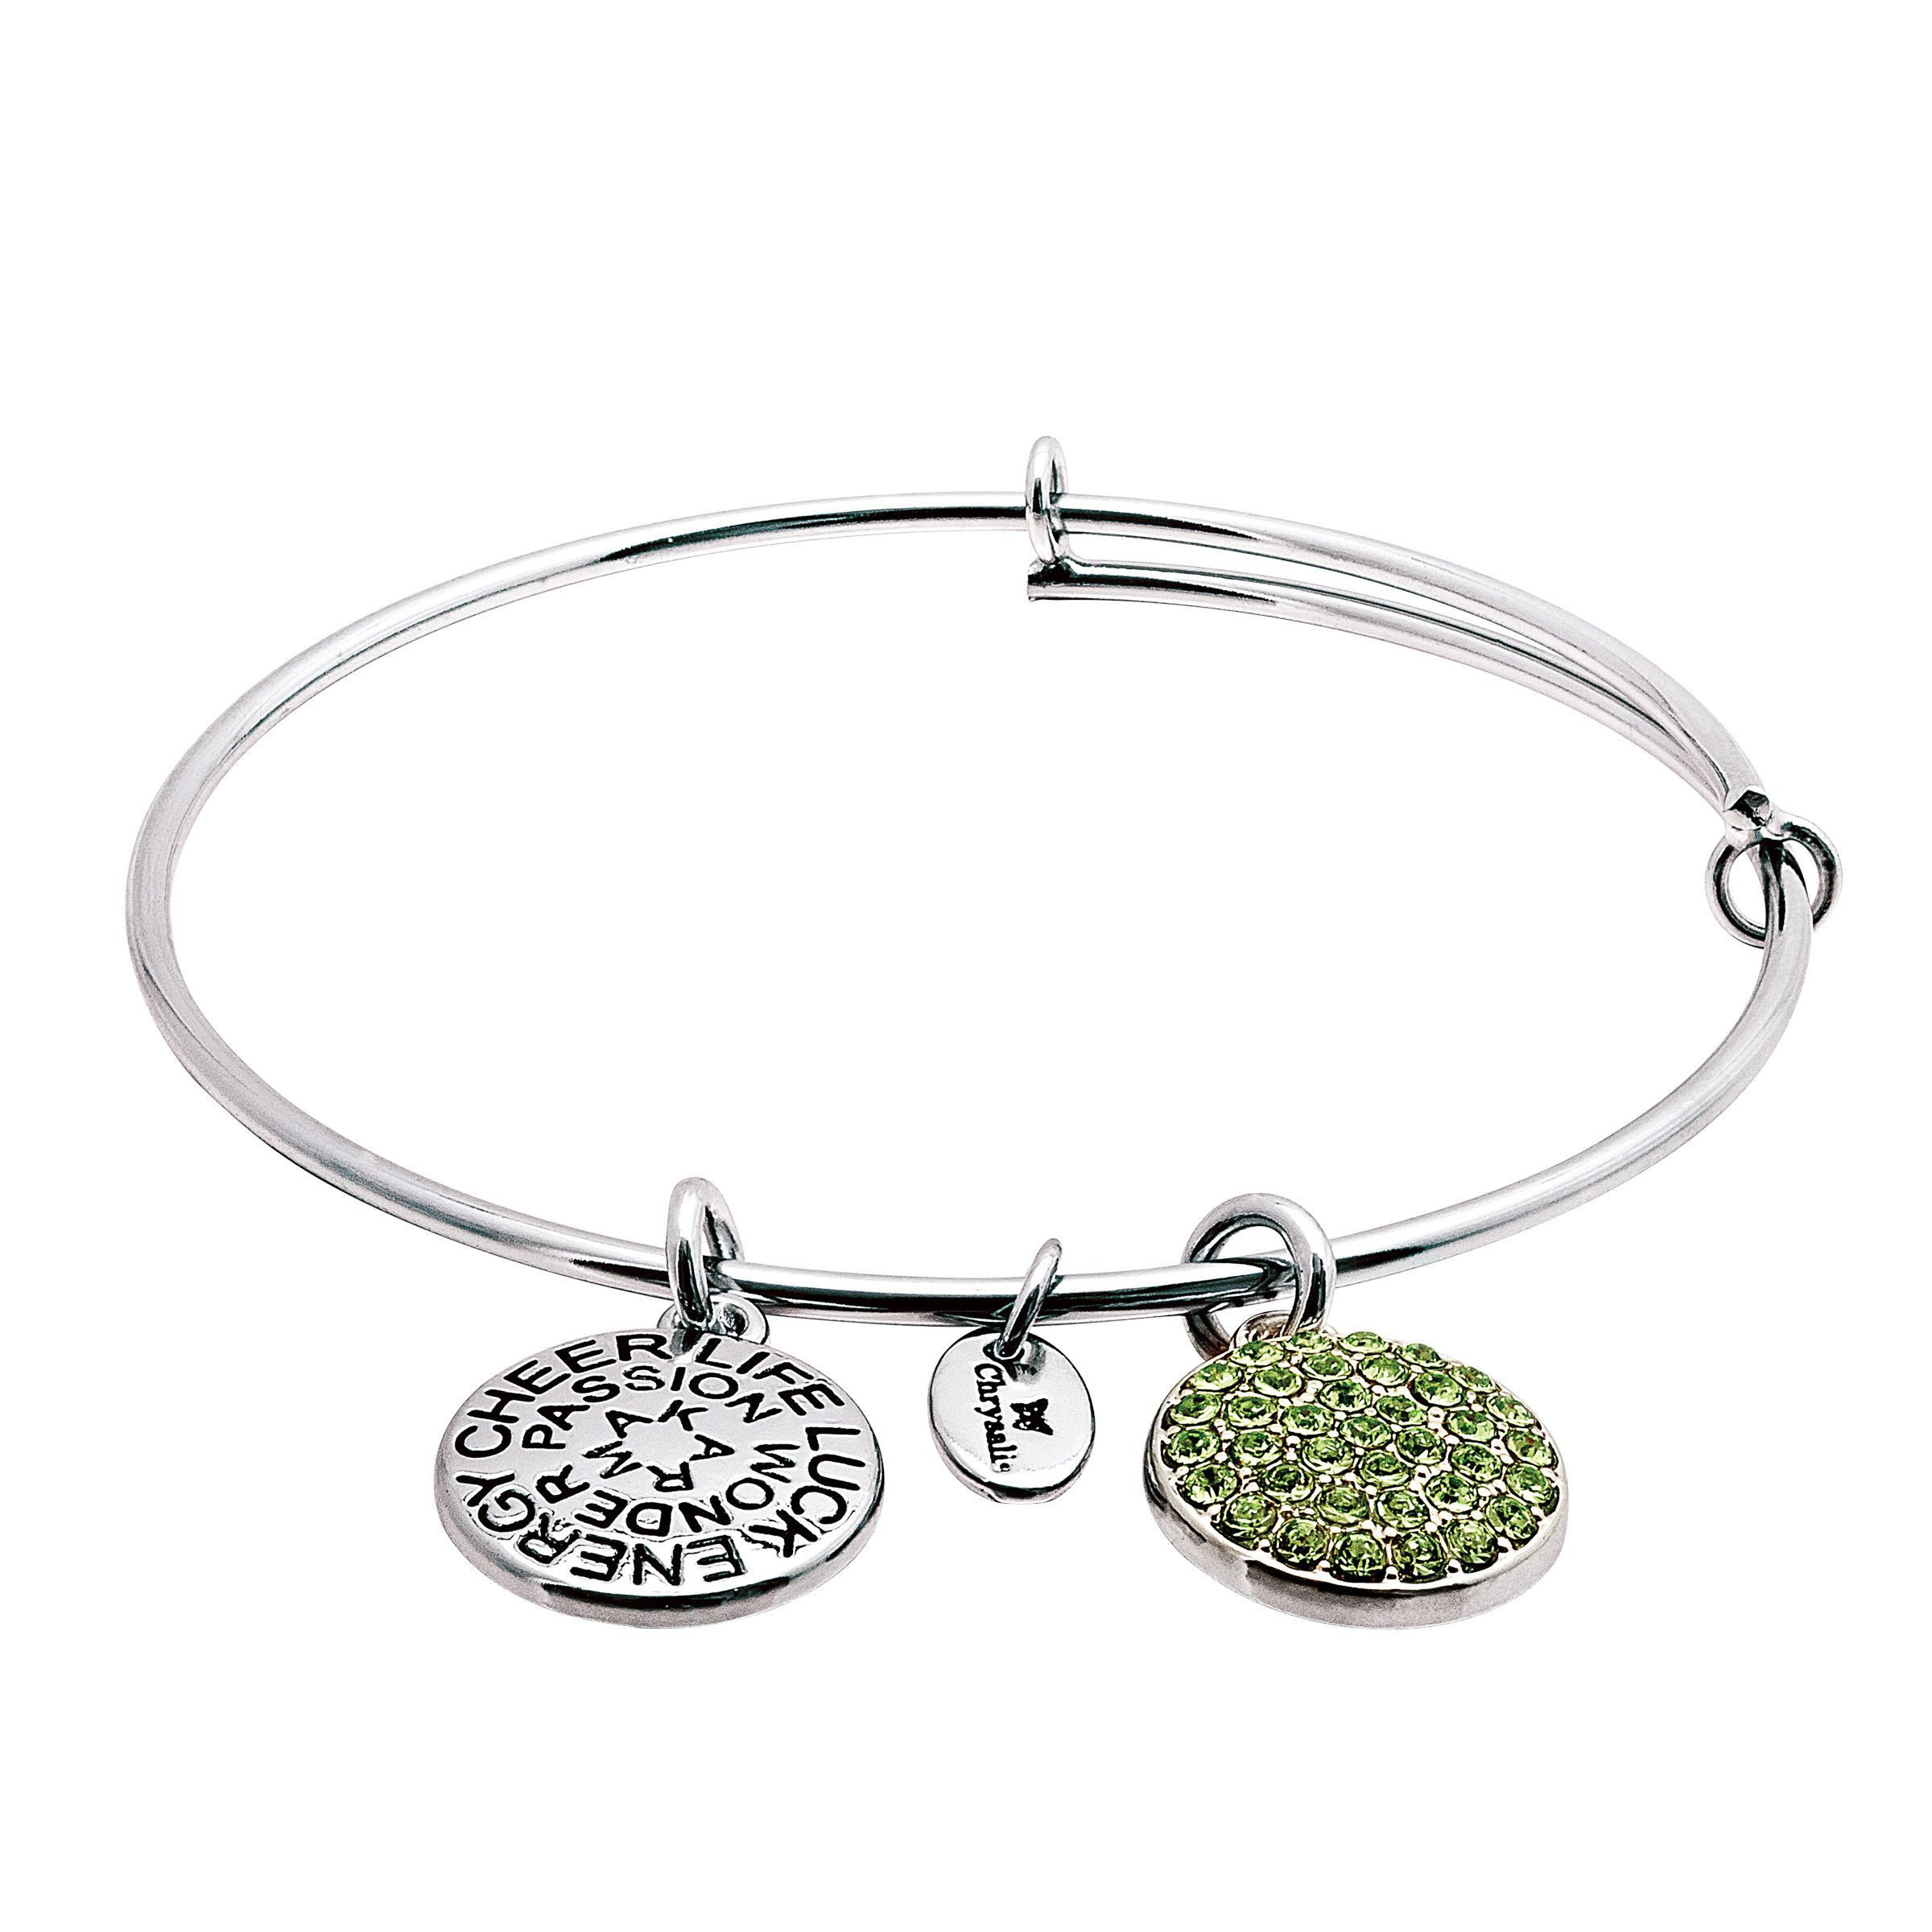 Good Karma Love Heart Bangle Bracelet Free Fast P/&P Great Gift